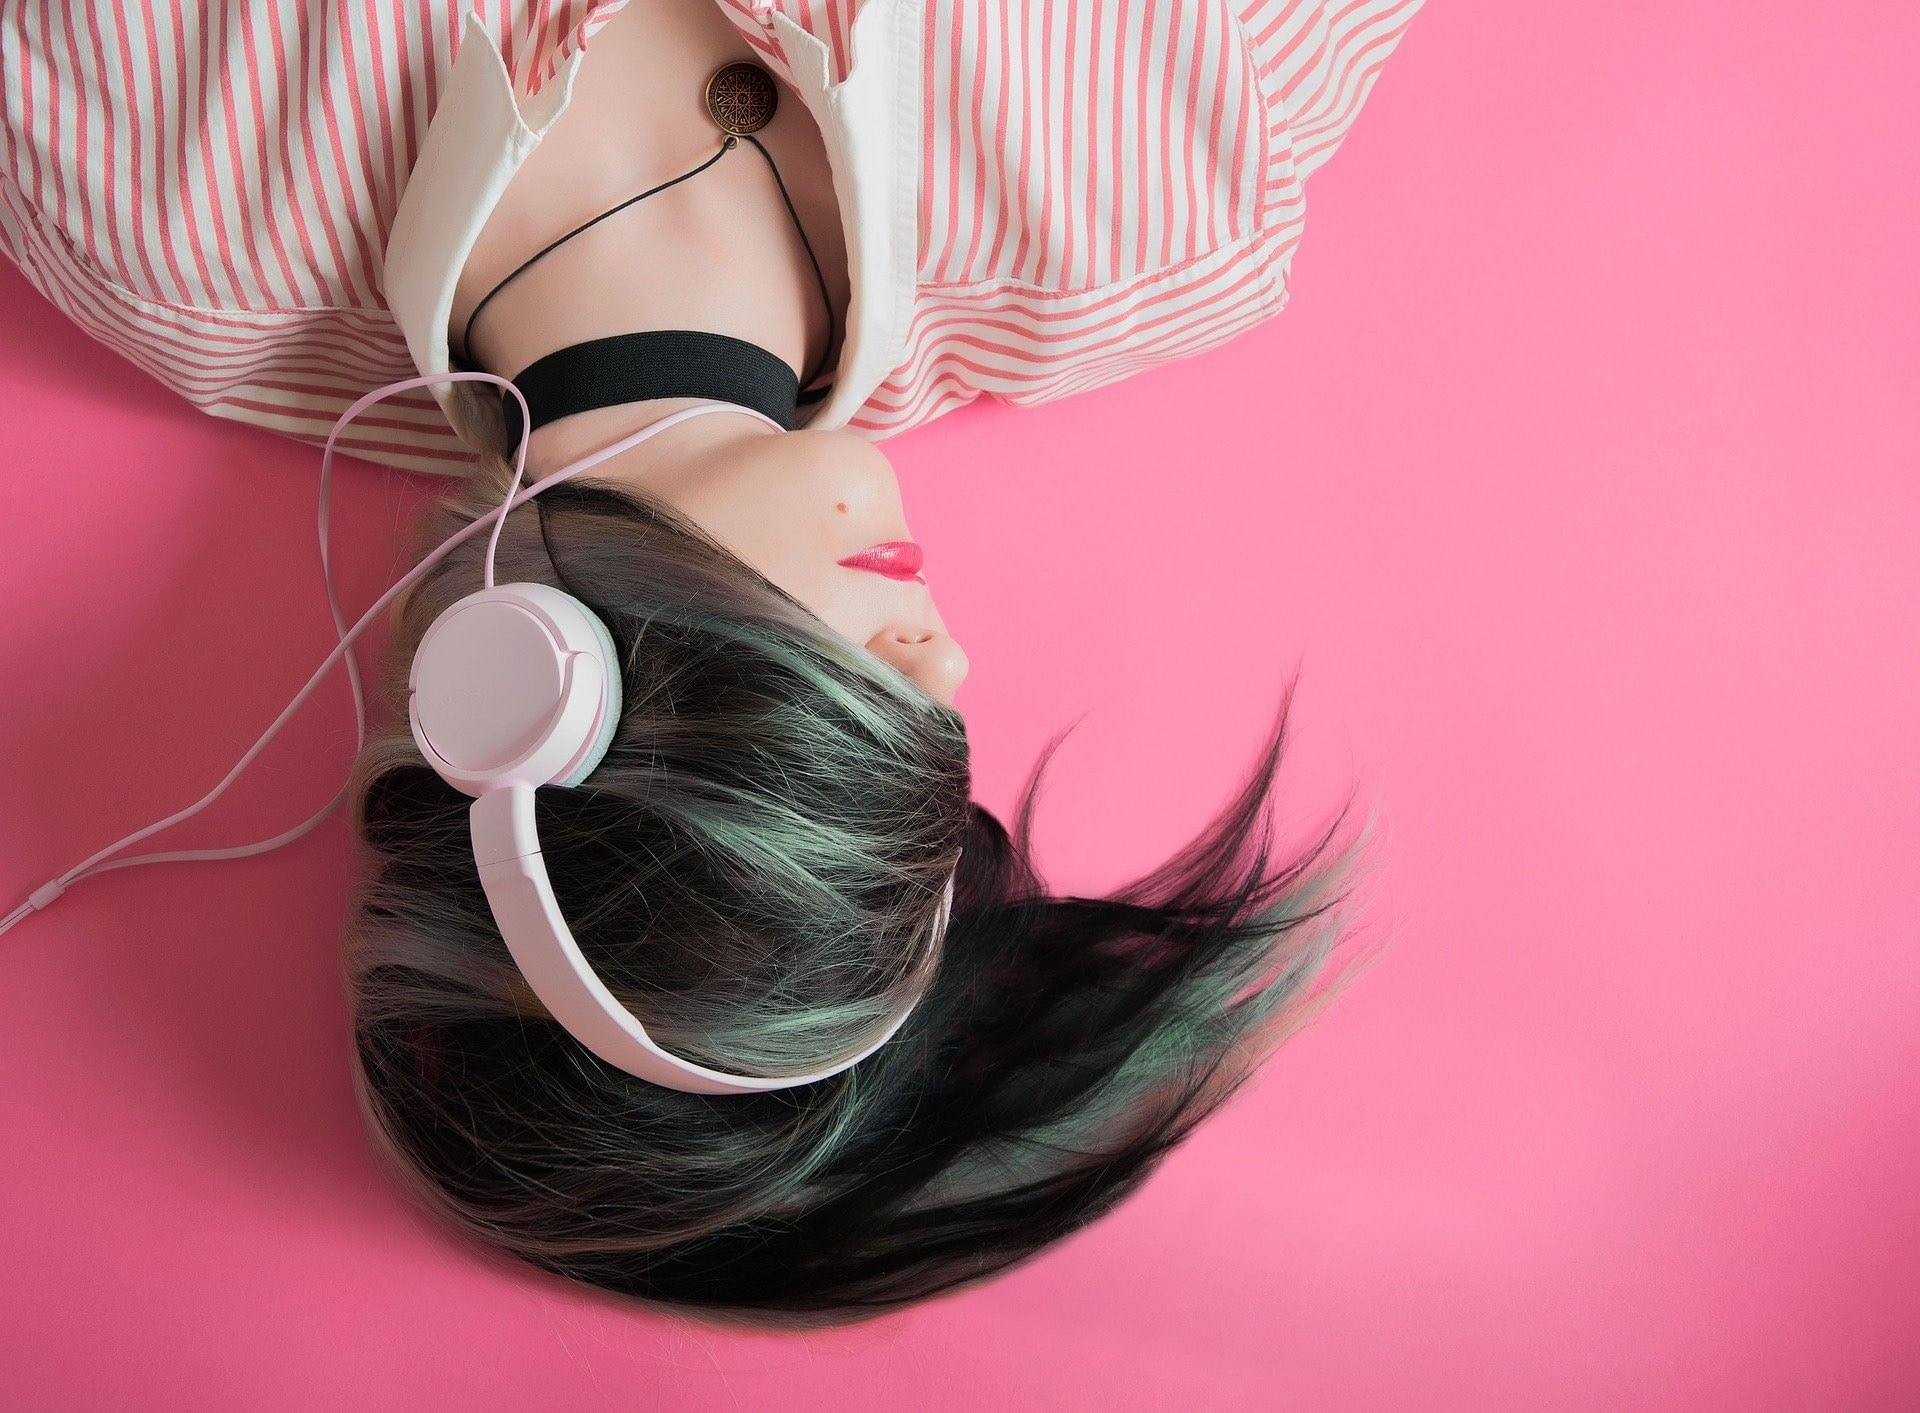 Girl Listening to Music-Pixabay